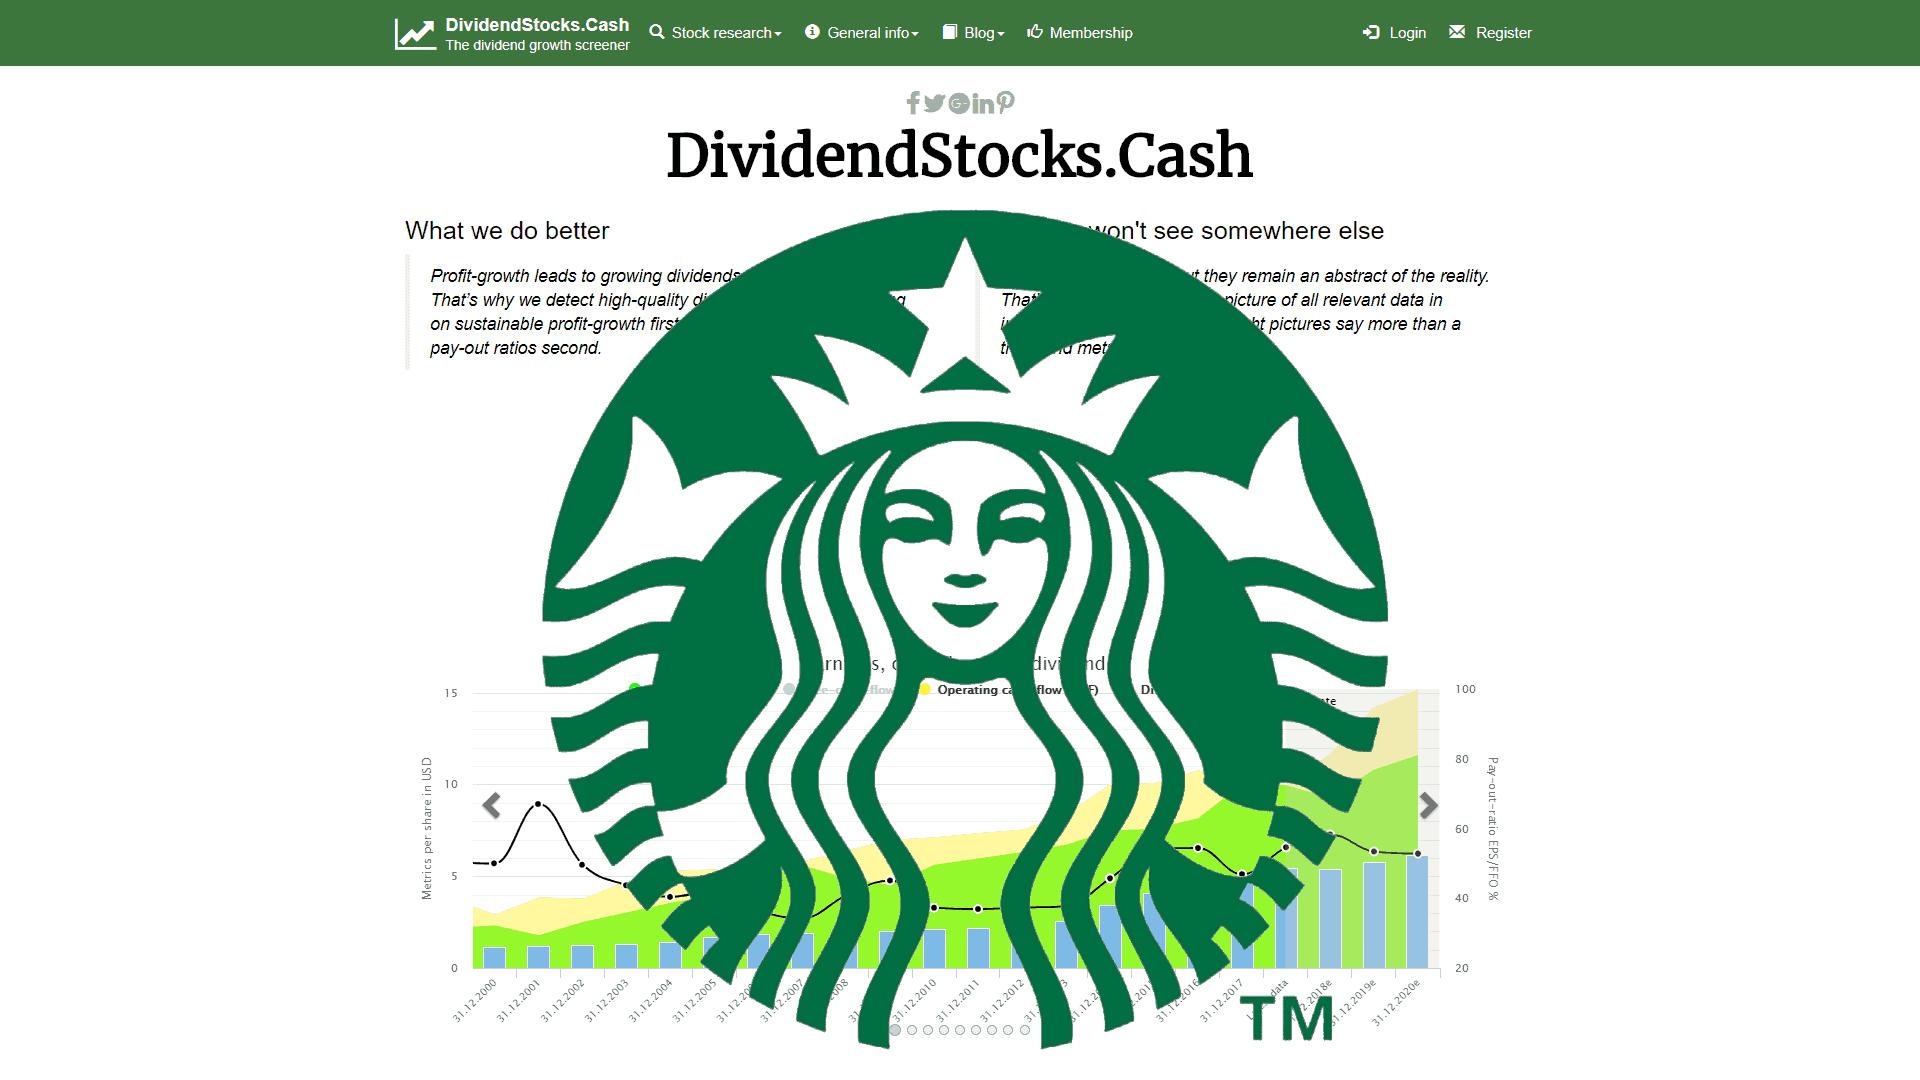 Starbucks - accounting hara-kiri of a stock market superhero?